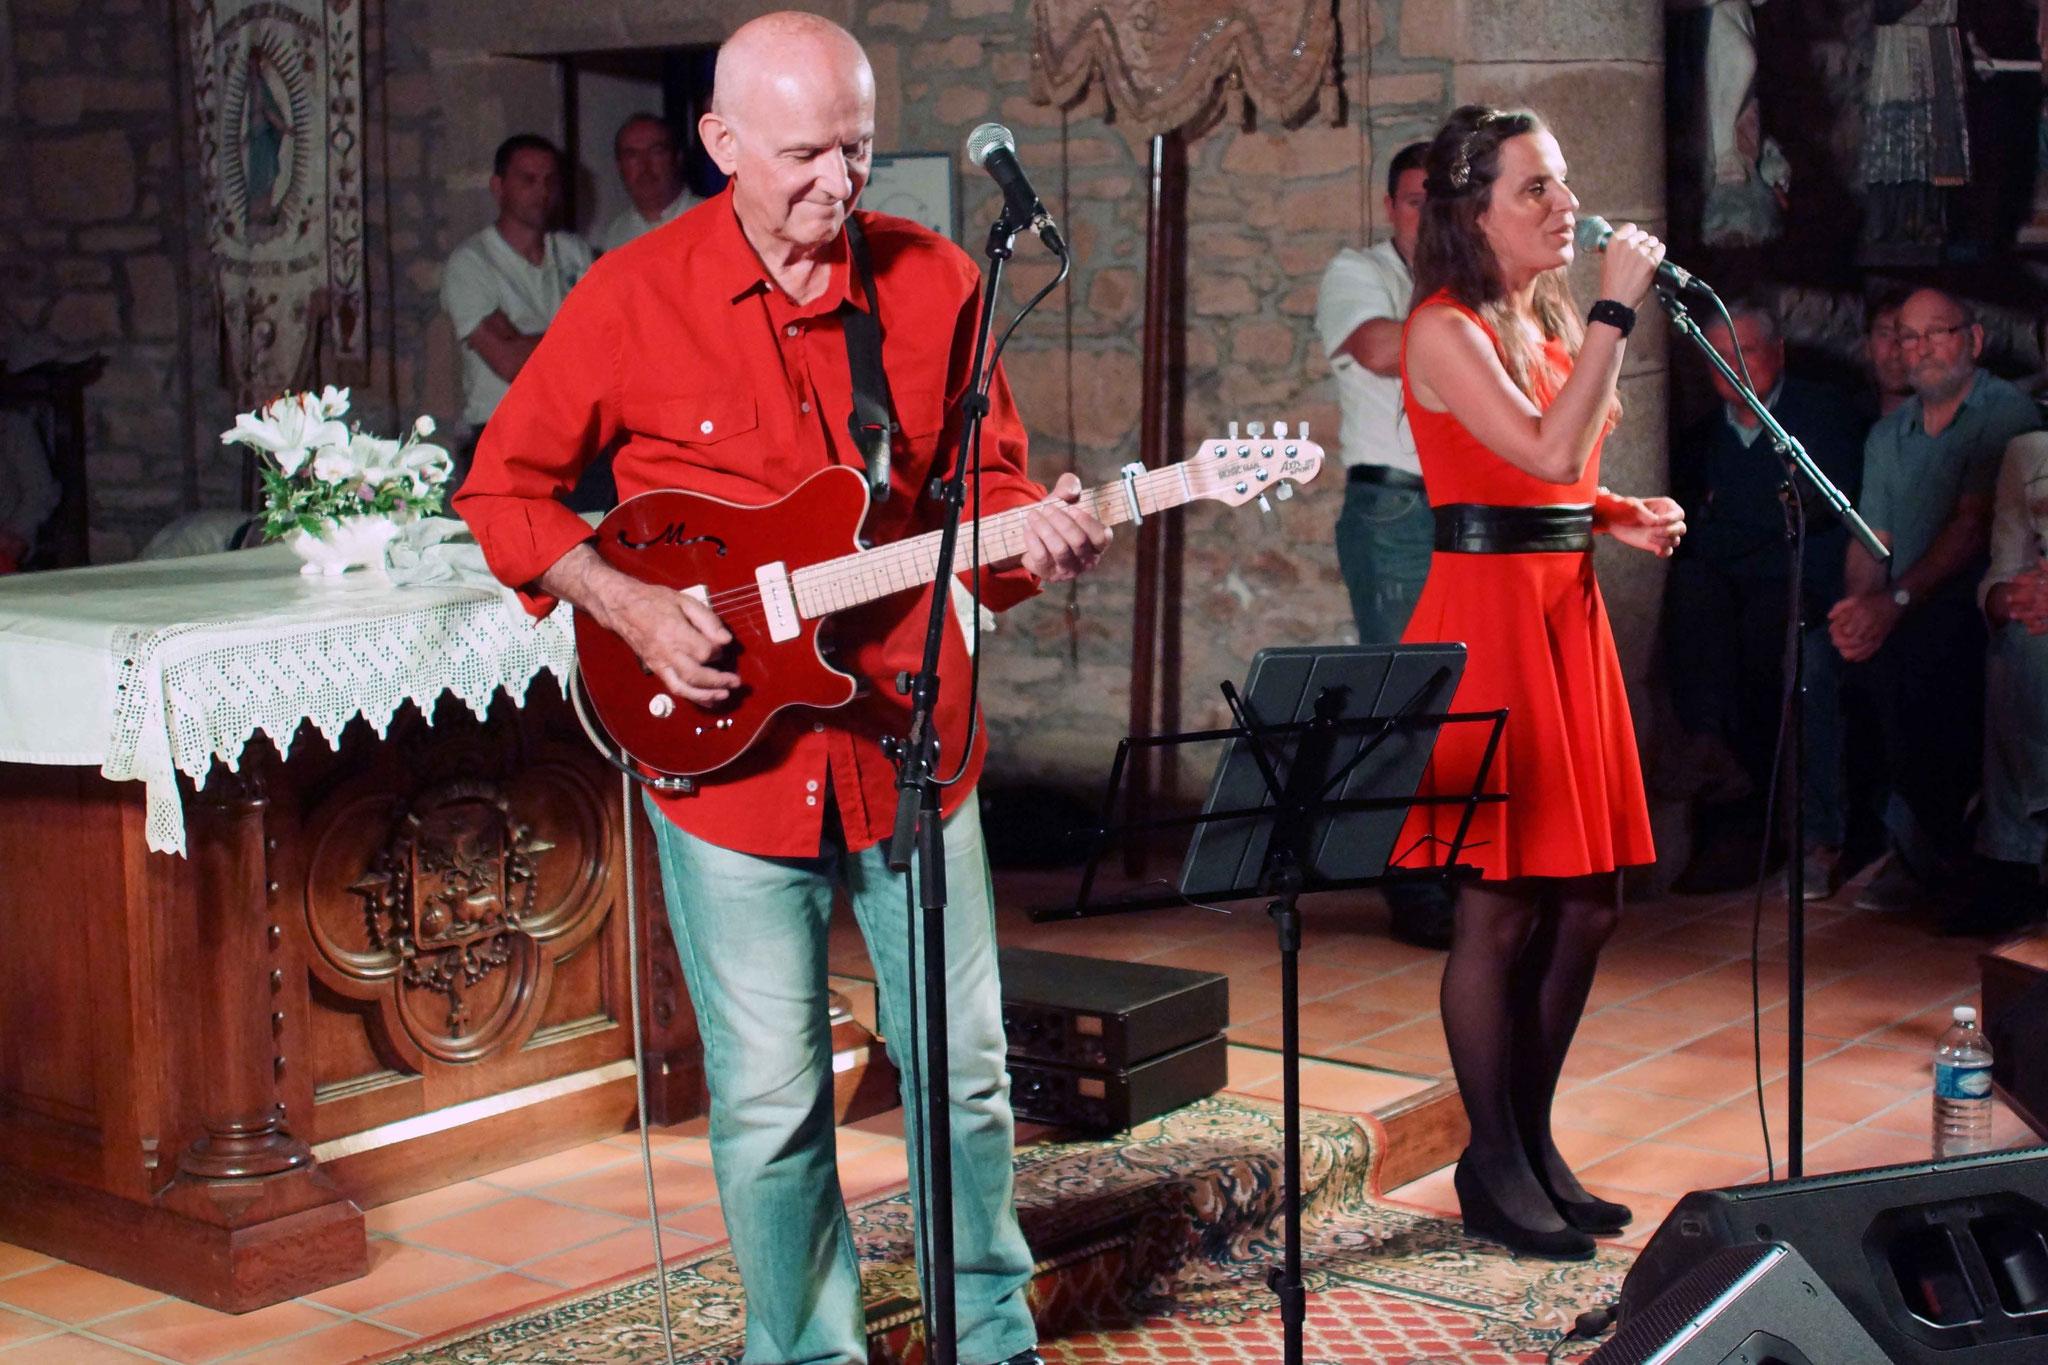 Concert de Kermaria Sulard, 28 août 2016 ; 1